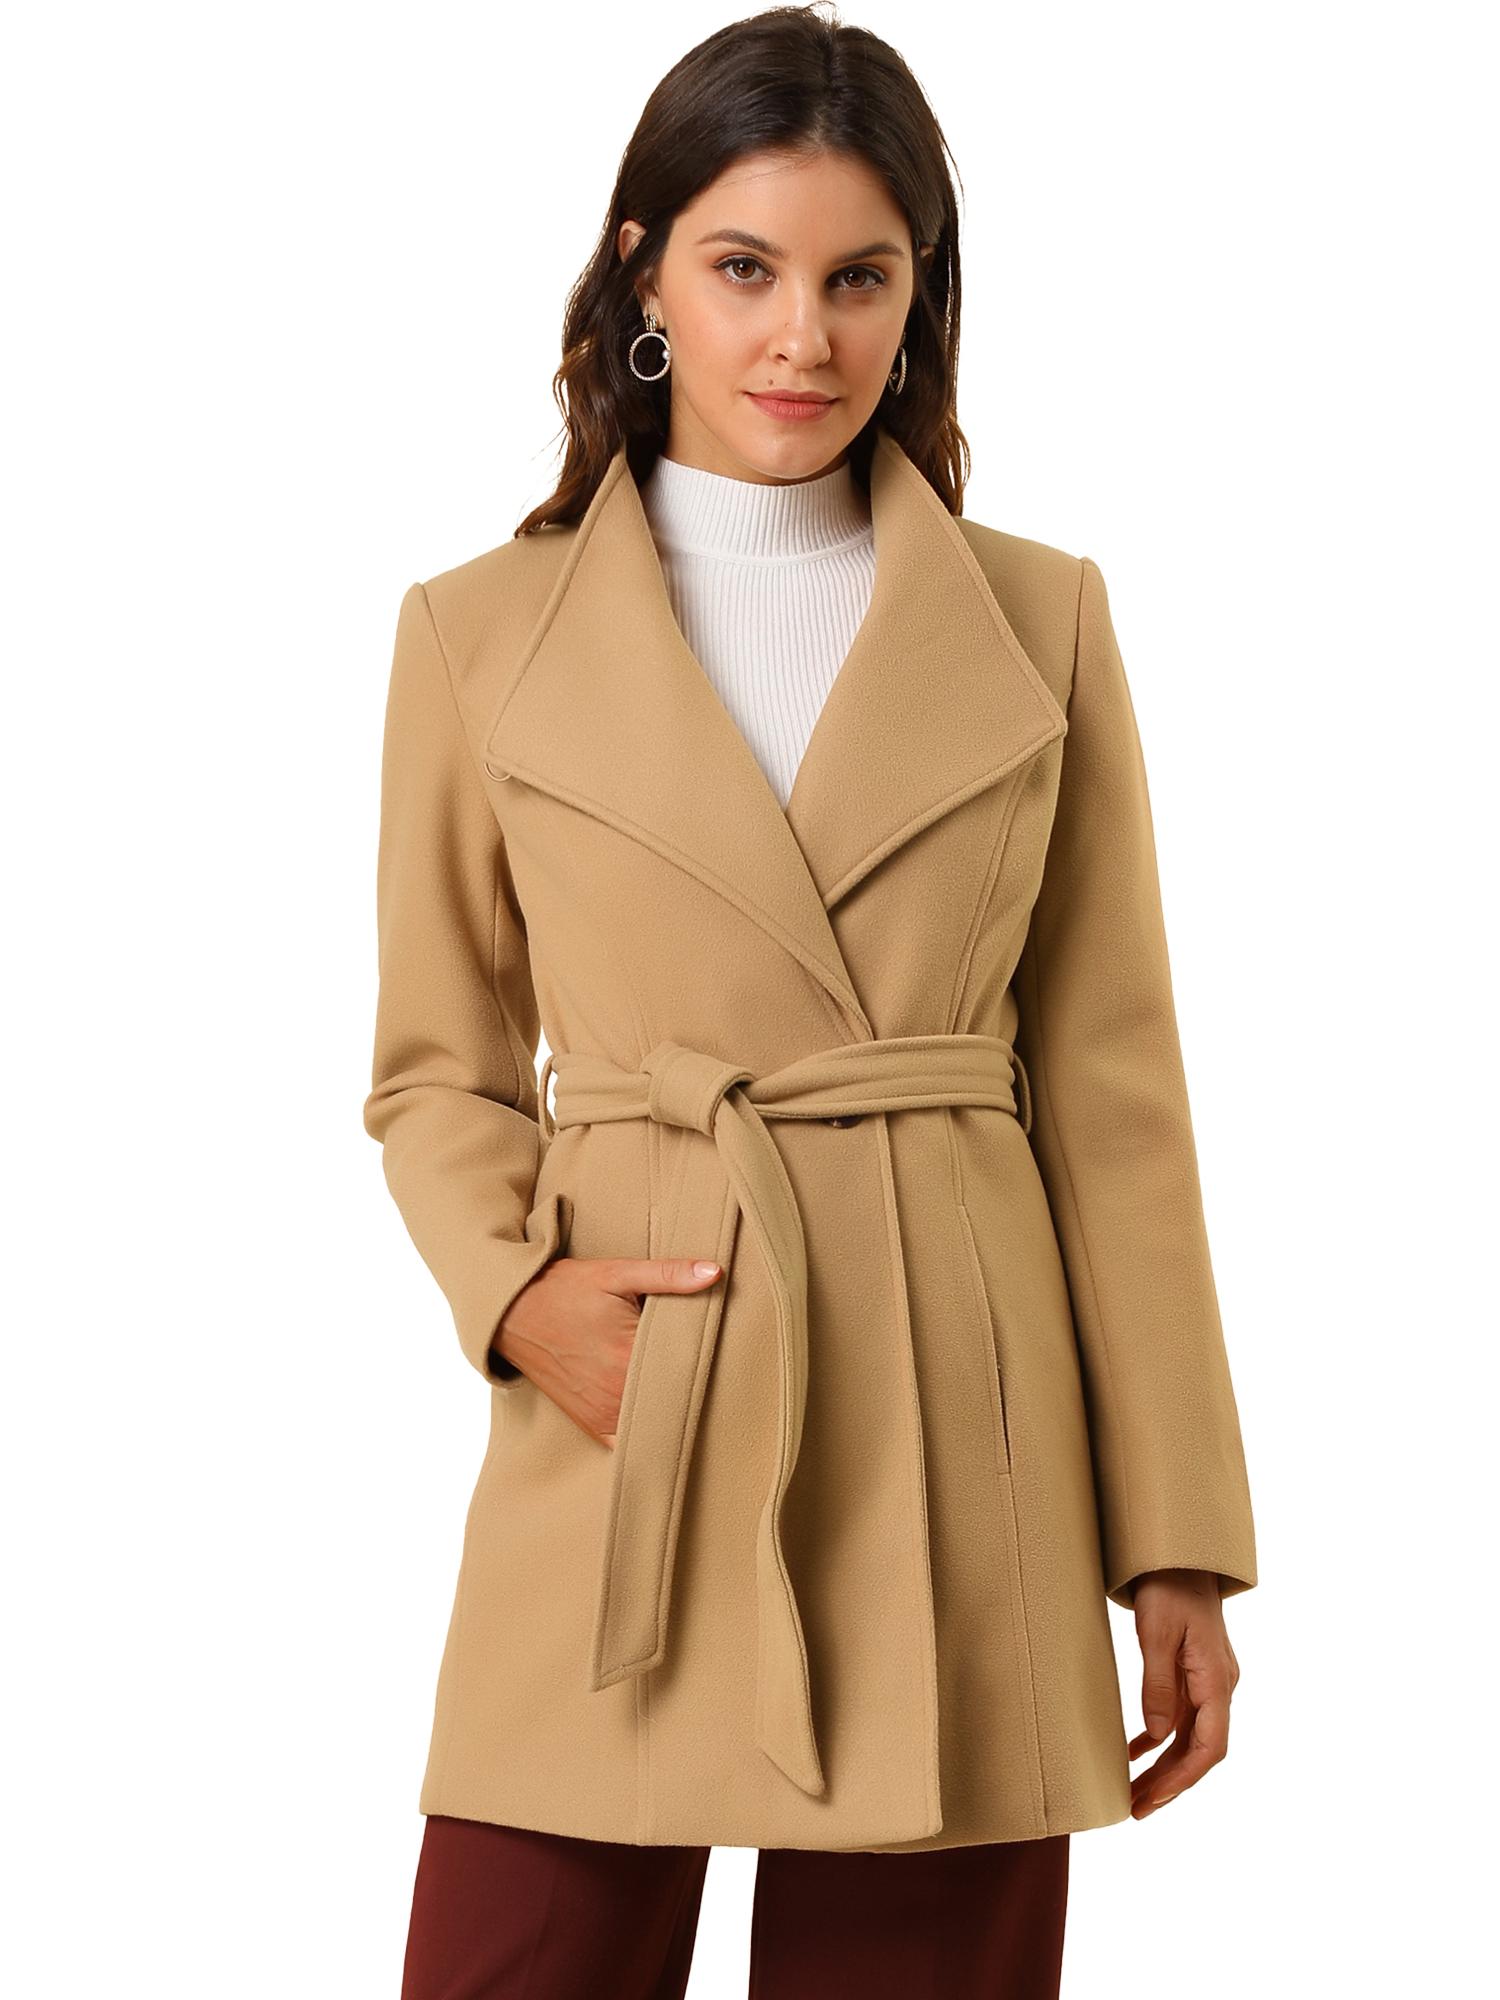 Allegra K Women's Stand Collar Tie Waist Casual Coat Khaki M